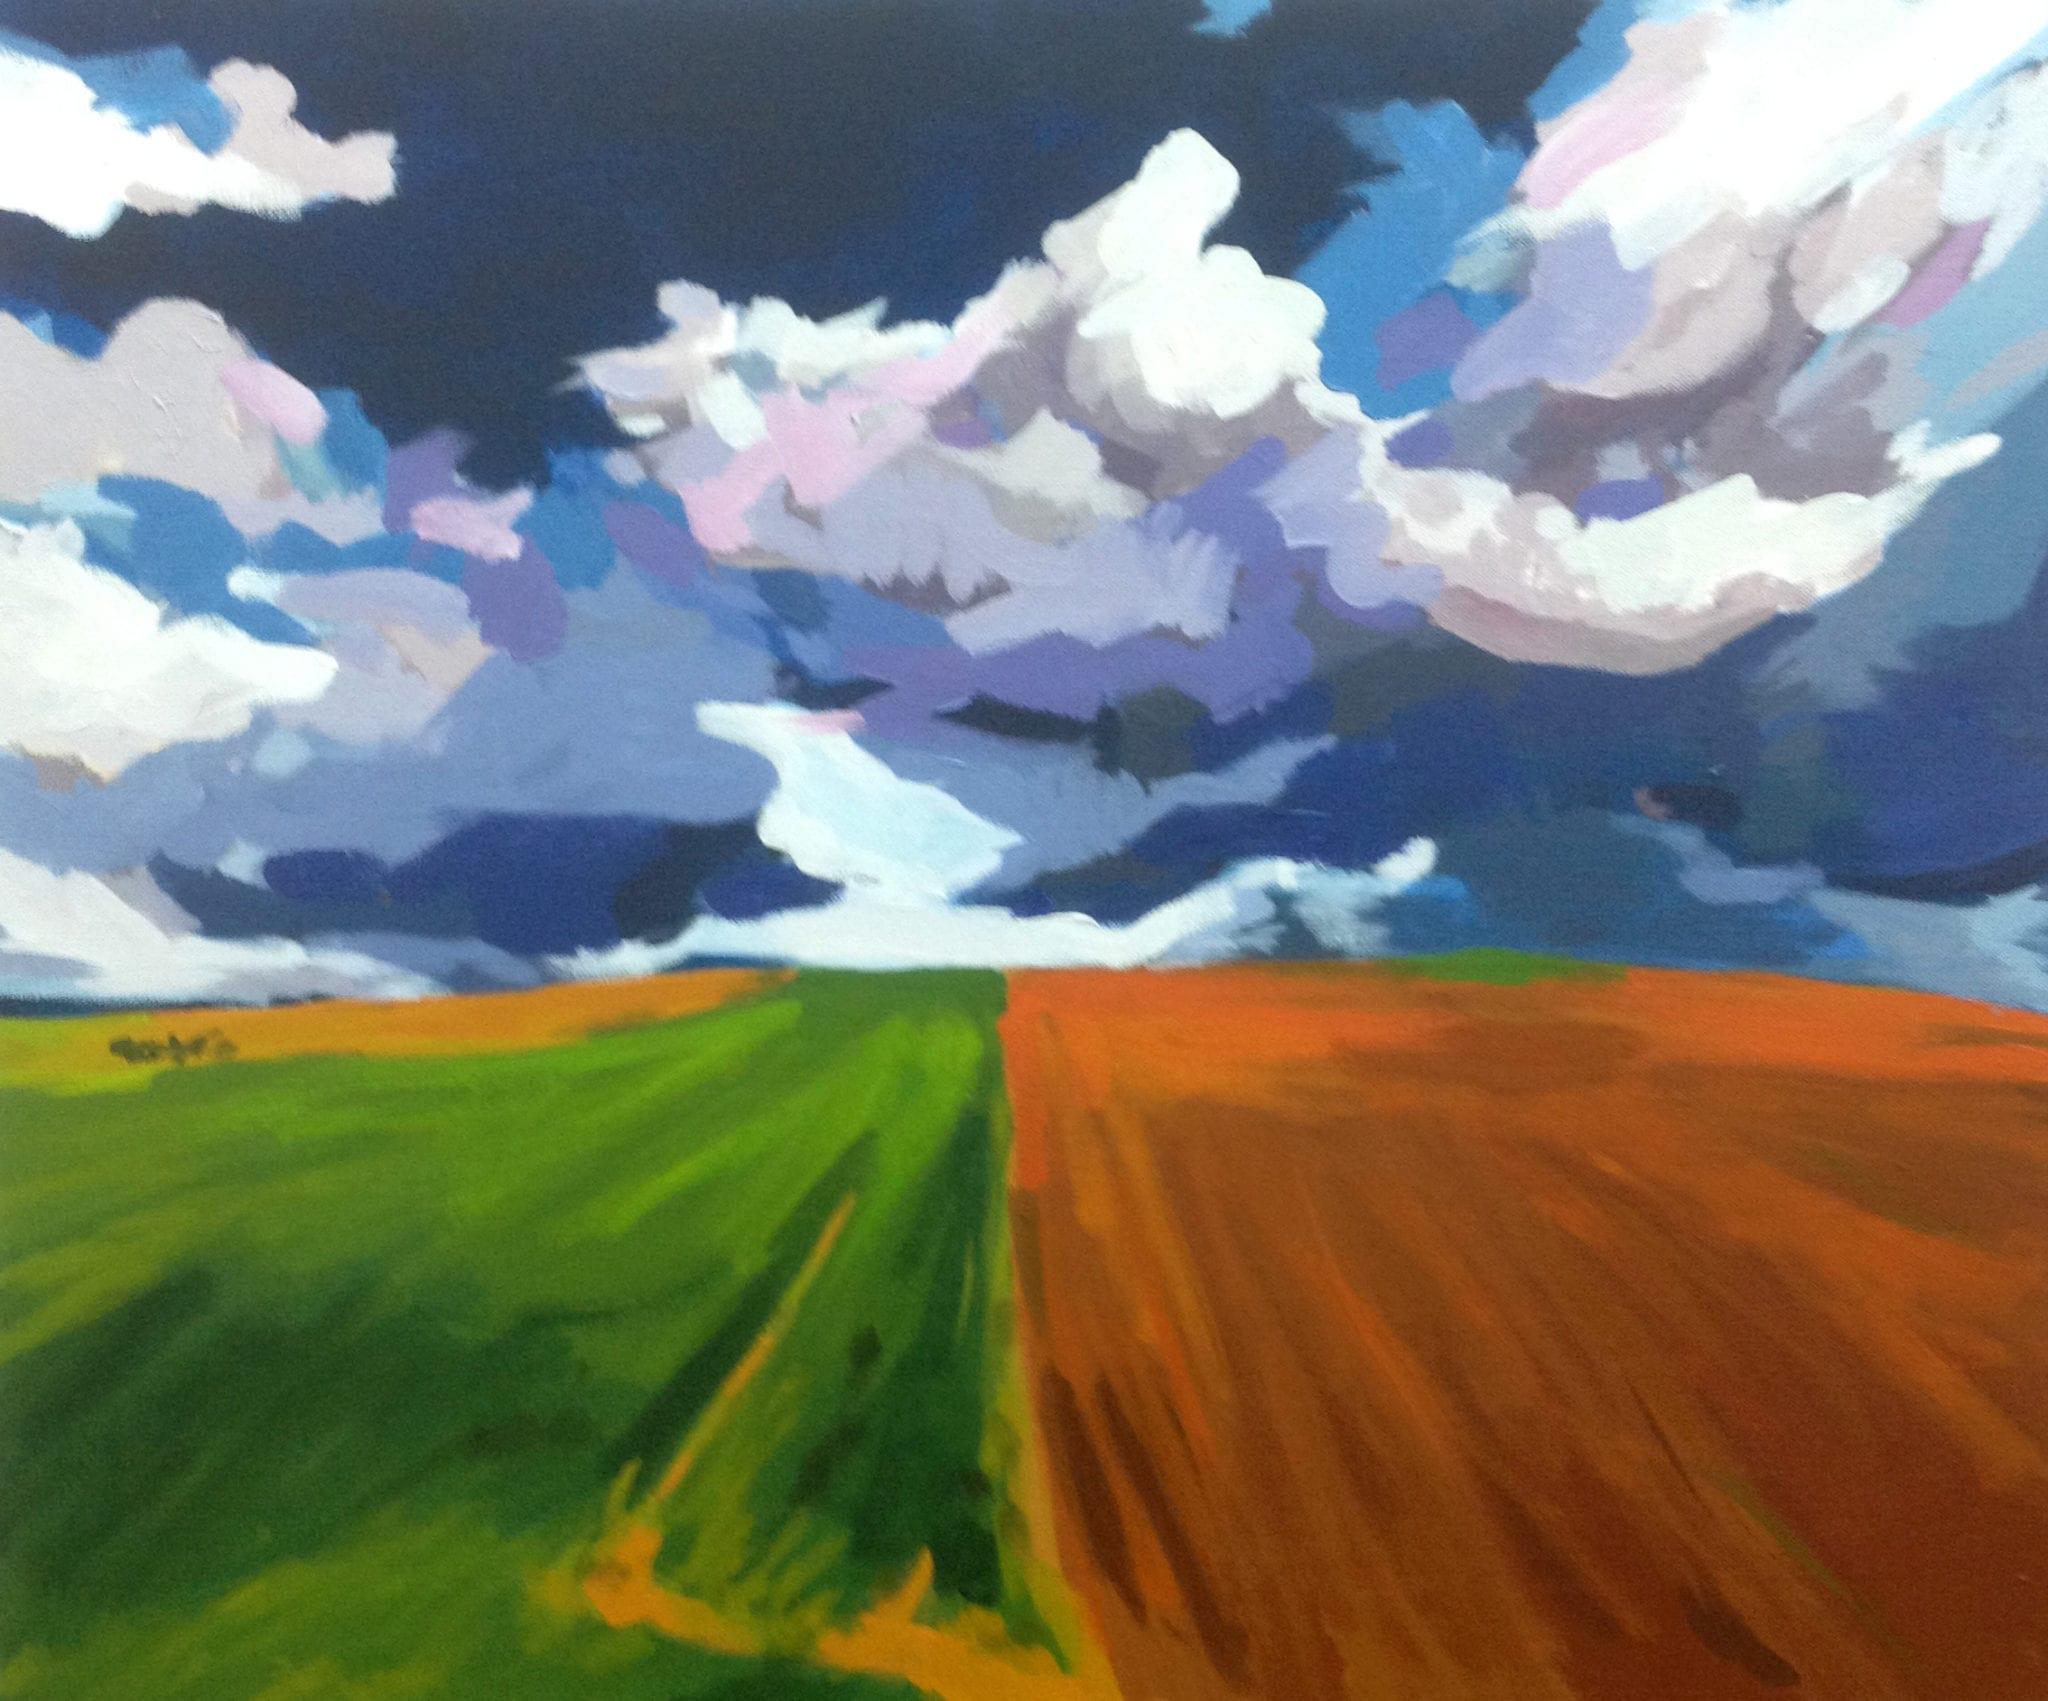 deGranero clases de pintura al óleo Madrid